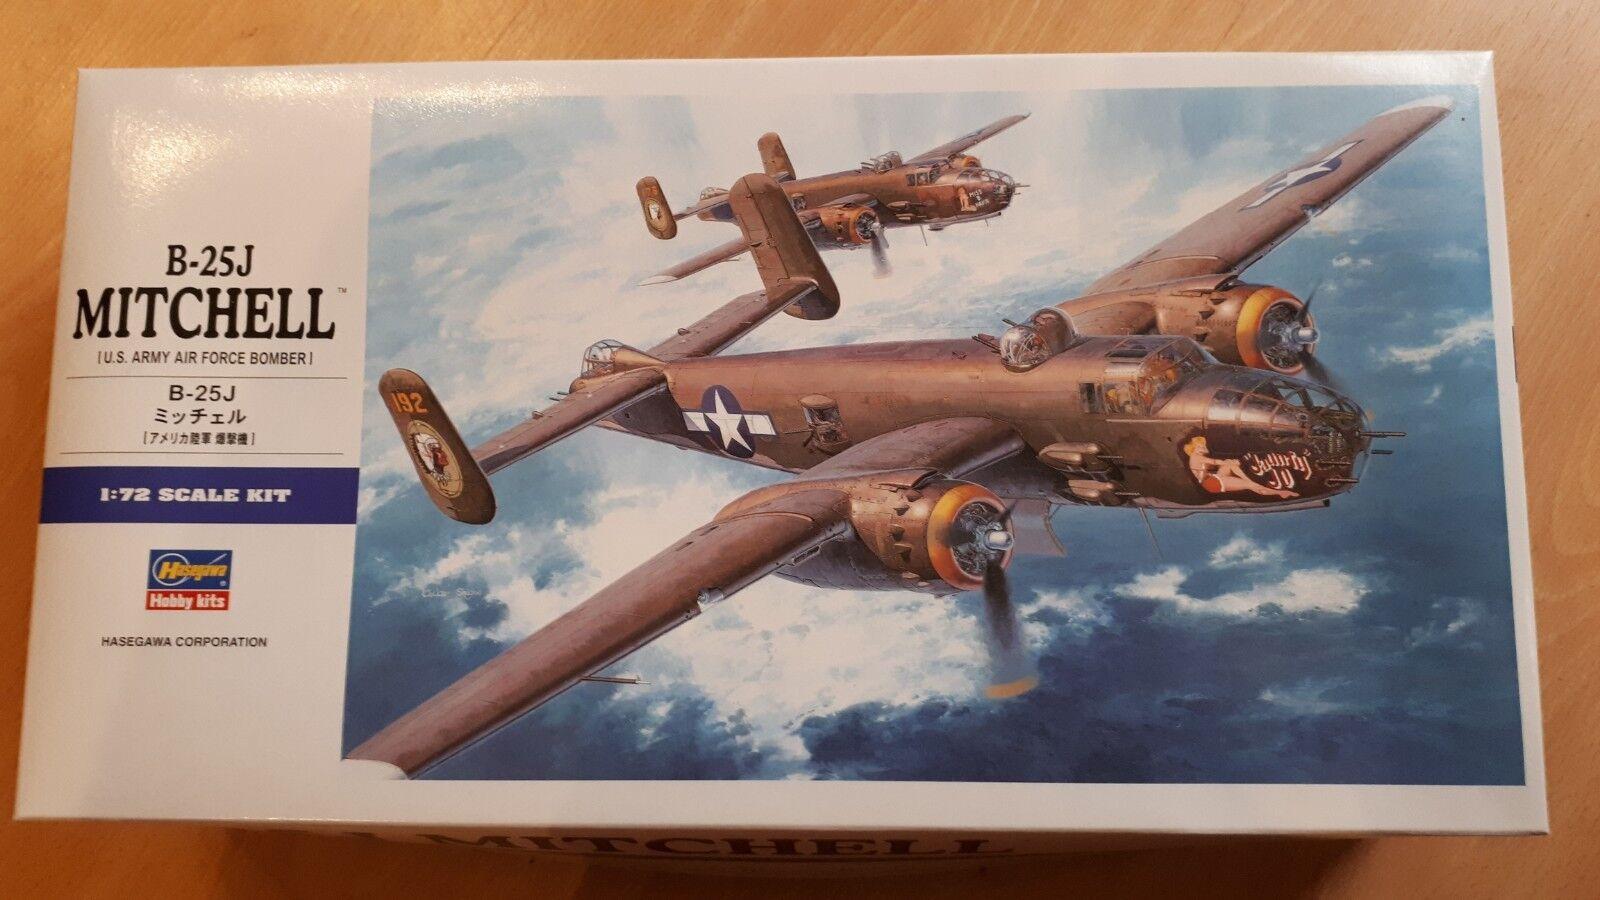 HASEGAWA 1 72 US ARMY AIR FORCE B-25J MITCHELL BOMBER